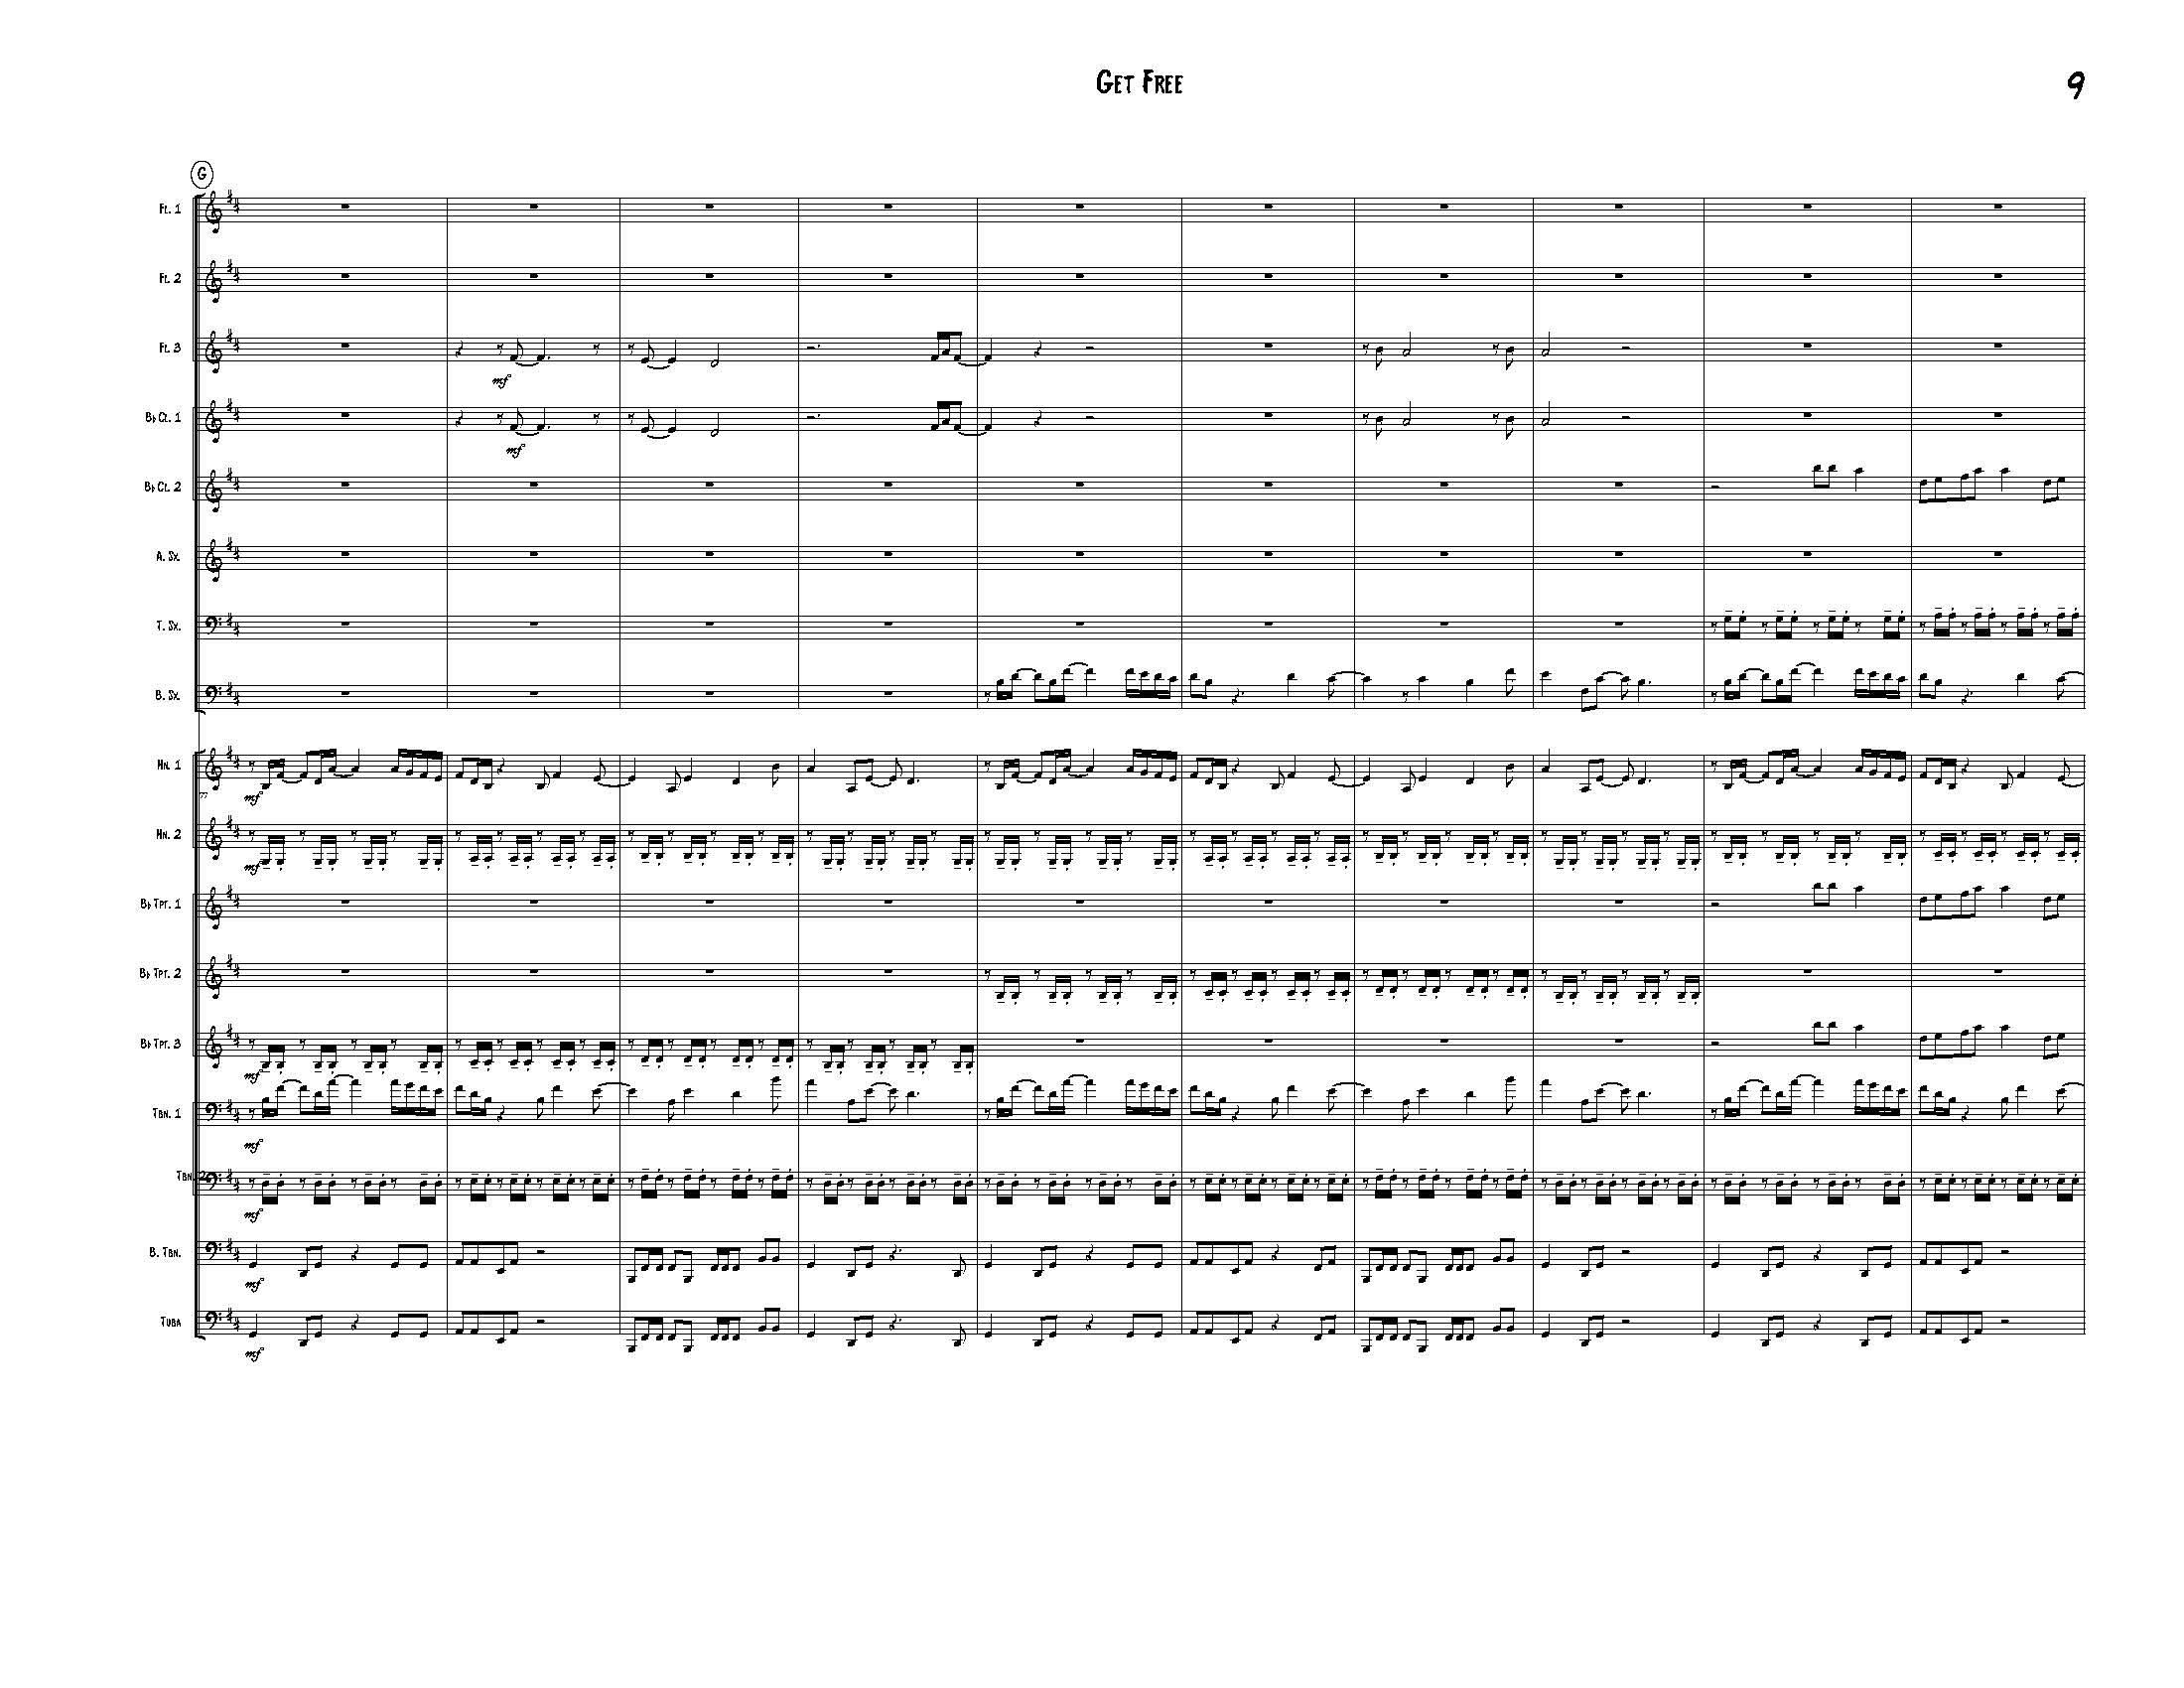 Get Free BKLYN 1834 Score_Page_09.jpg